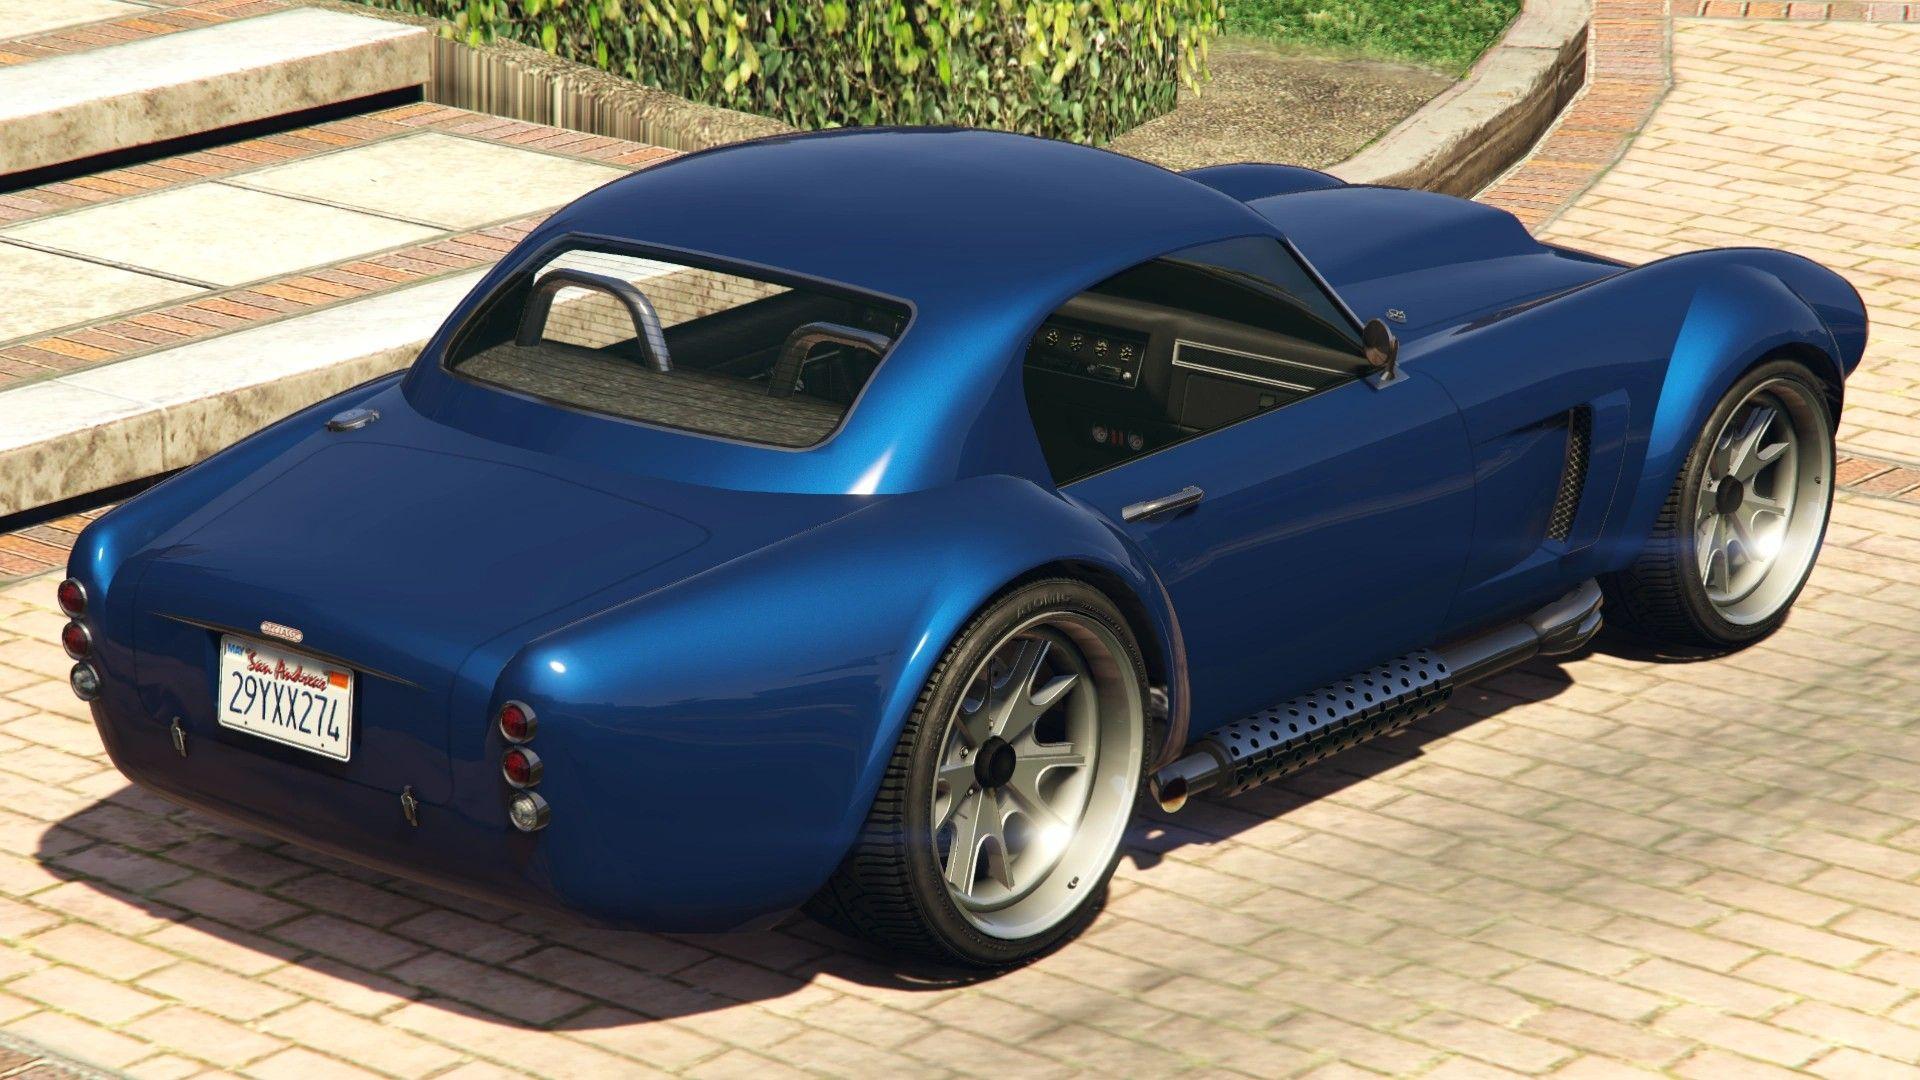 Pin by Ricardo Rodriguez on gta 5 vehicles | Sports car ...